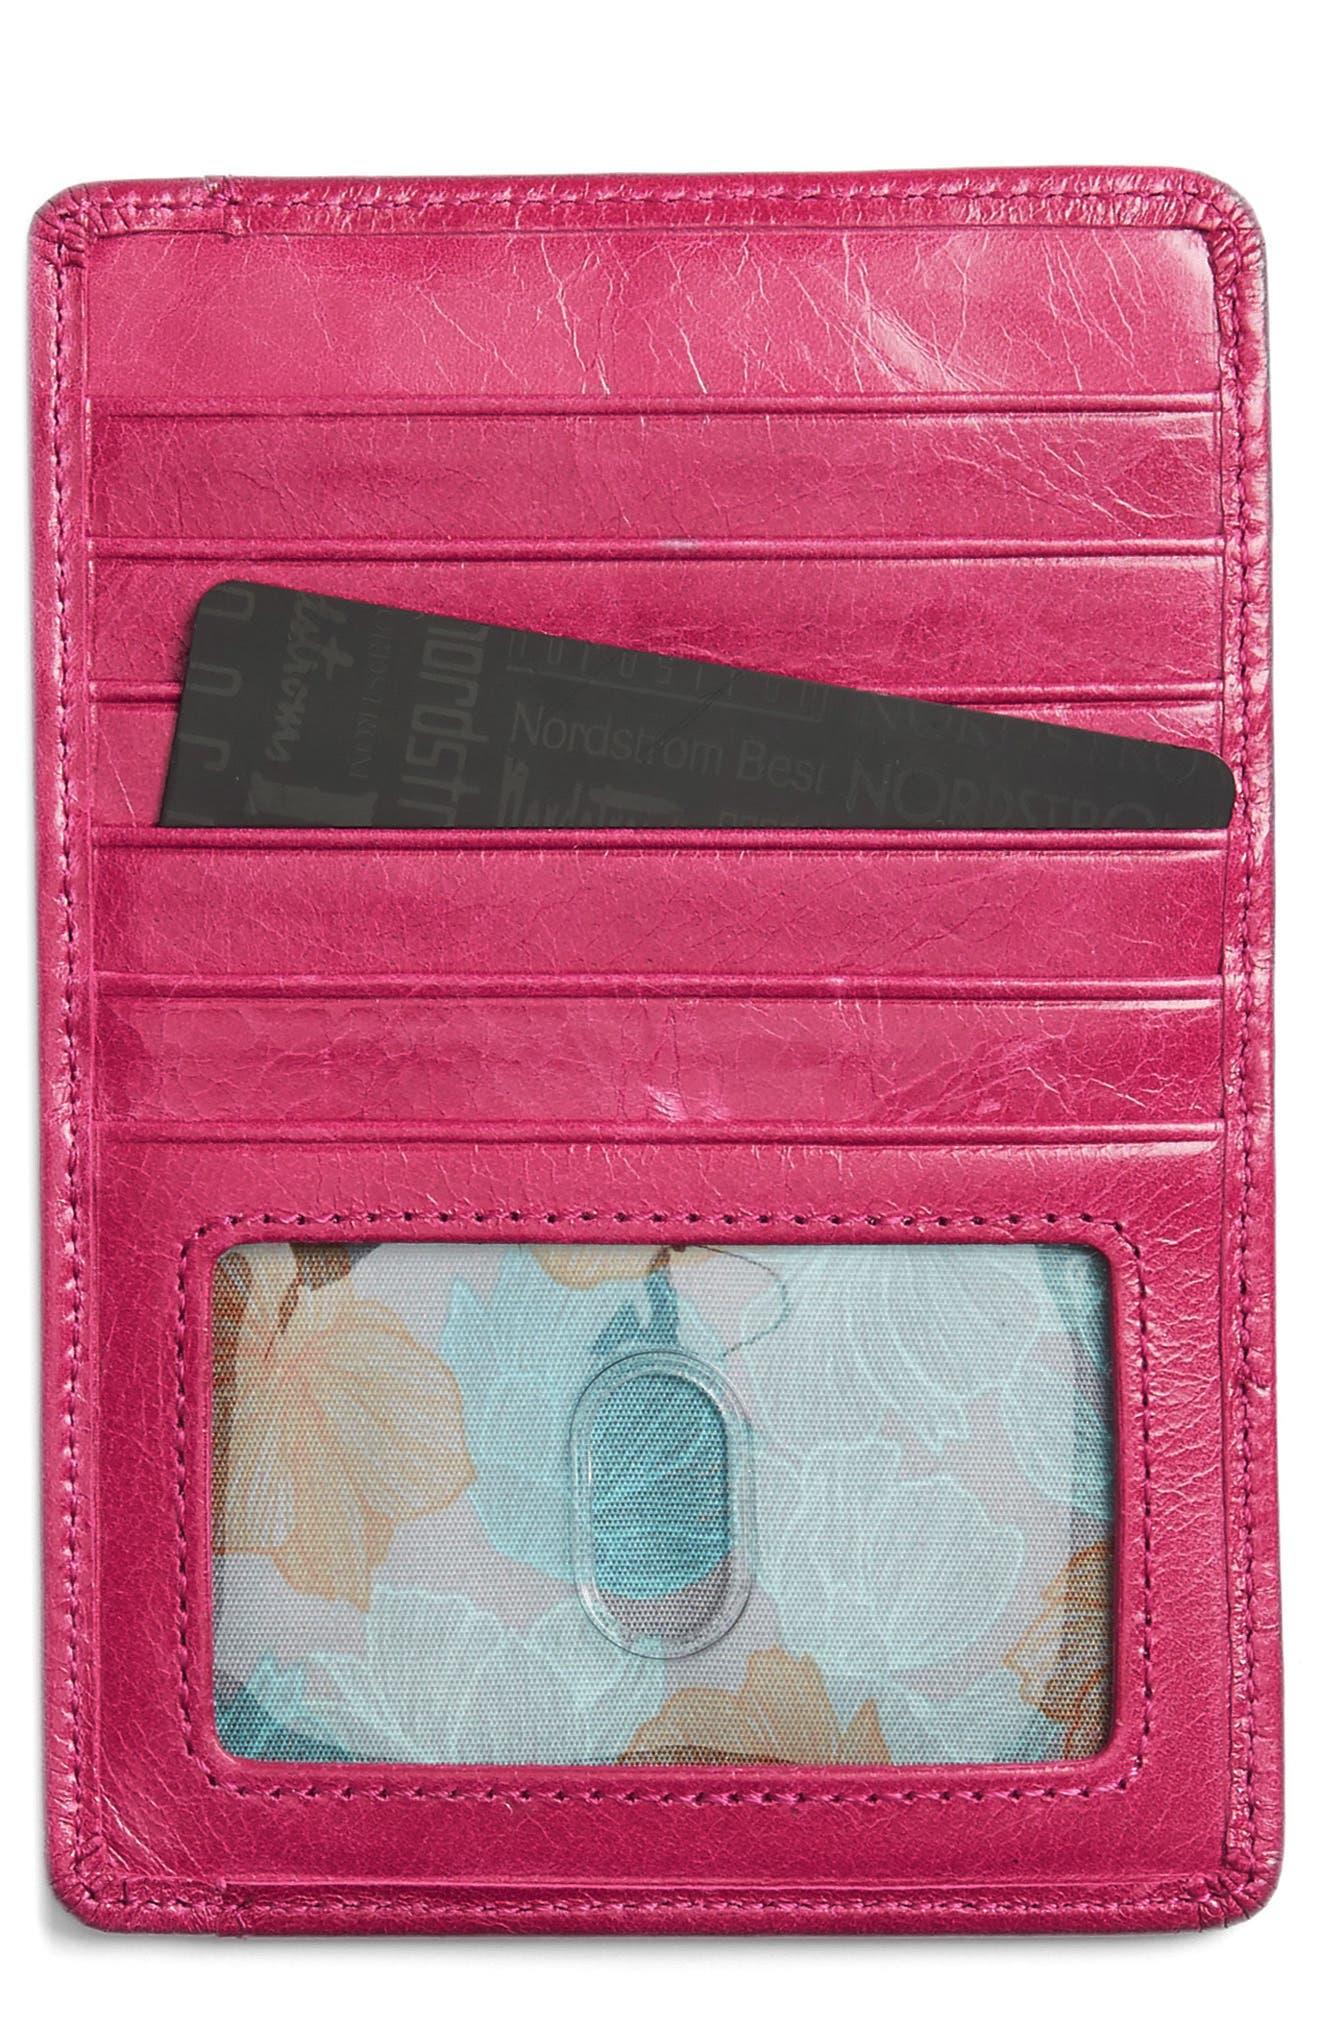 Alternate Image 1 Selected - Hobo 'Euro Slide' Credit Card & Passport Case